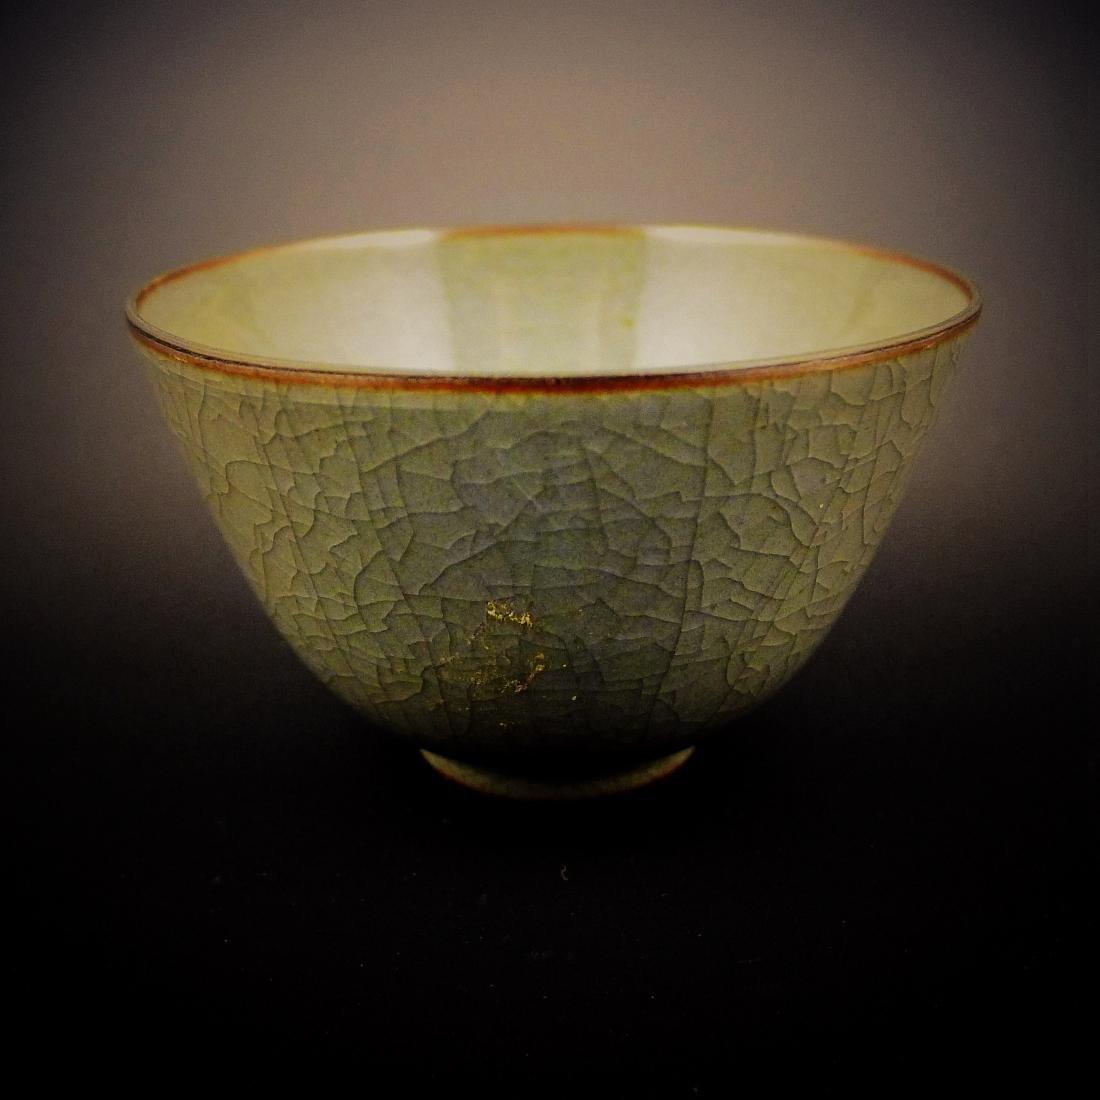 Mid-Qing Dynasty Chenghua Imitation Cup